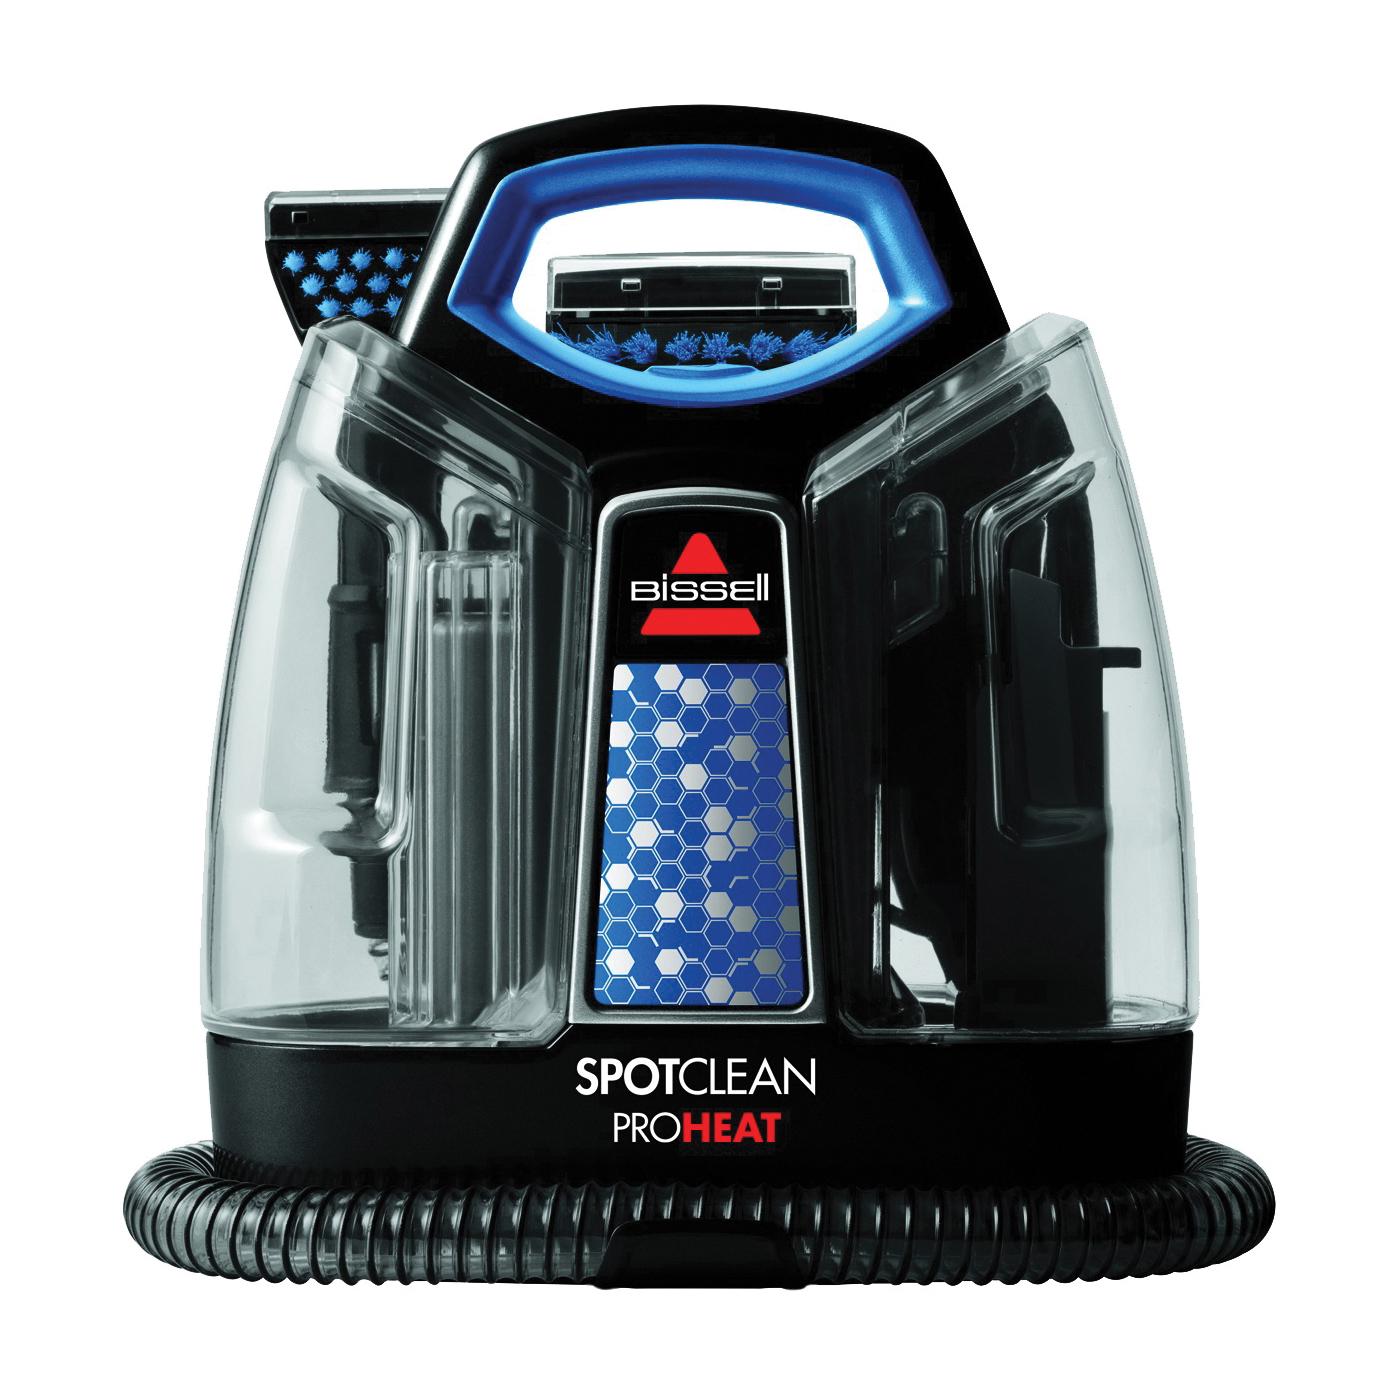 Picture of BISSELL 5207U Carpet Cleaner, 37 oz Tank, Black/Motley Blue